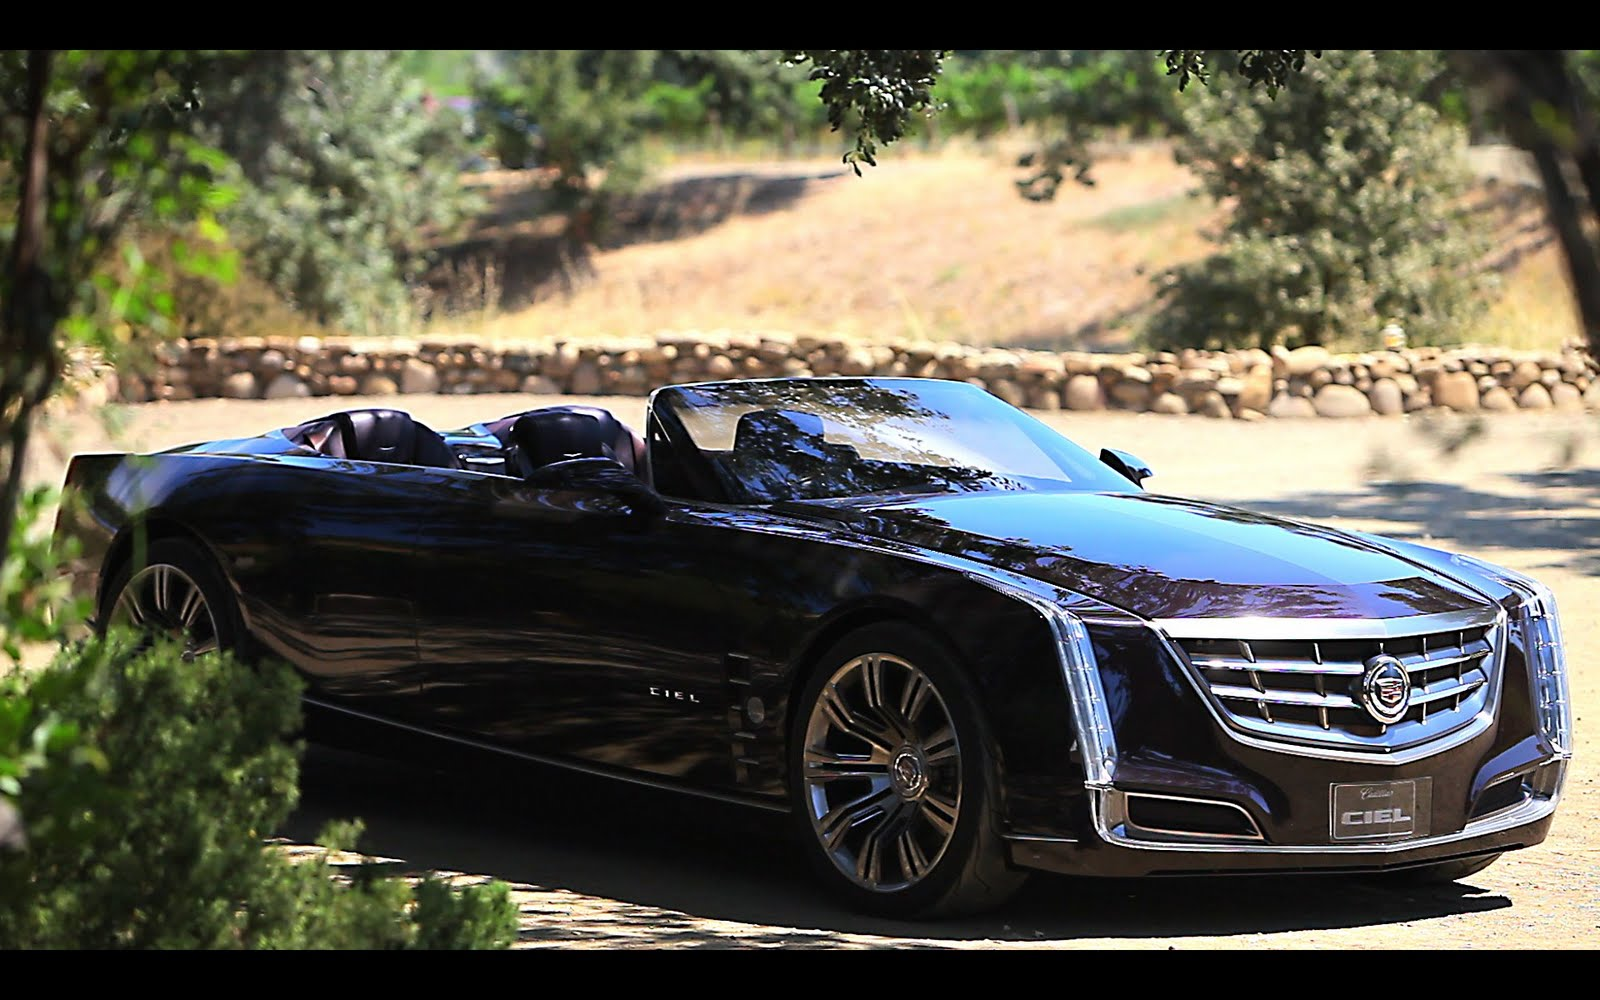 http://2.bp.blogspot.com/-eGOvegiW1JE/TlFmEtpQ1RI/AAAAAAAAAxc/fU6SDgRwxso/s1600/Cadillac-Ciel-Concept-2011-widescreen-11.jpg